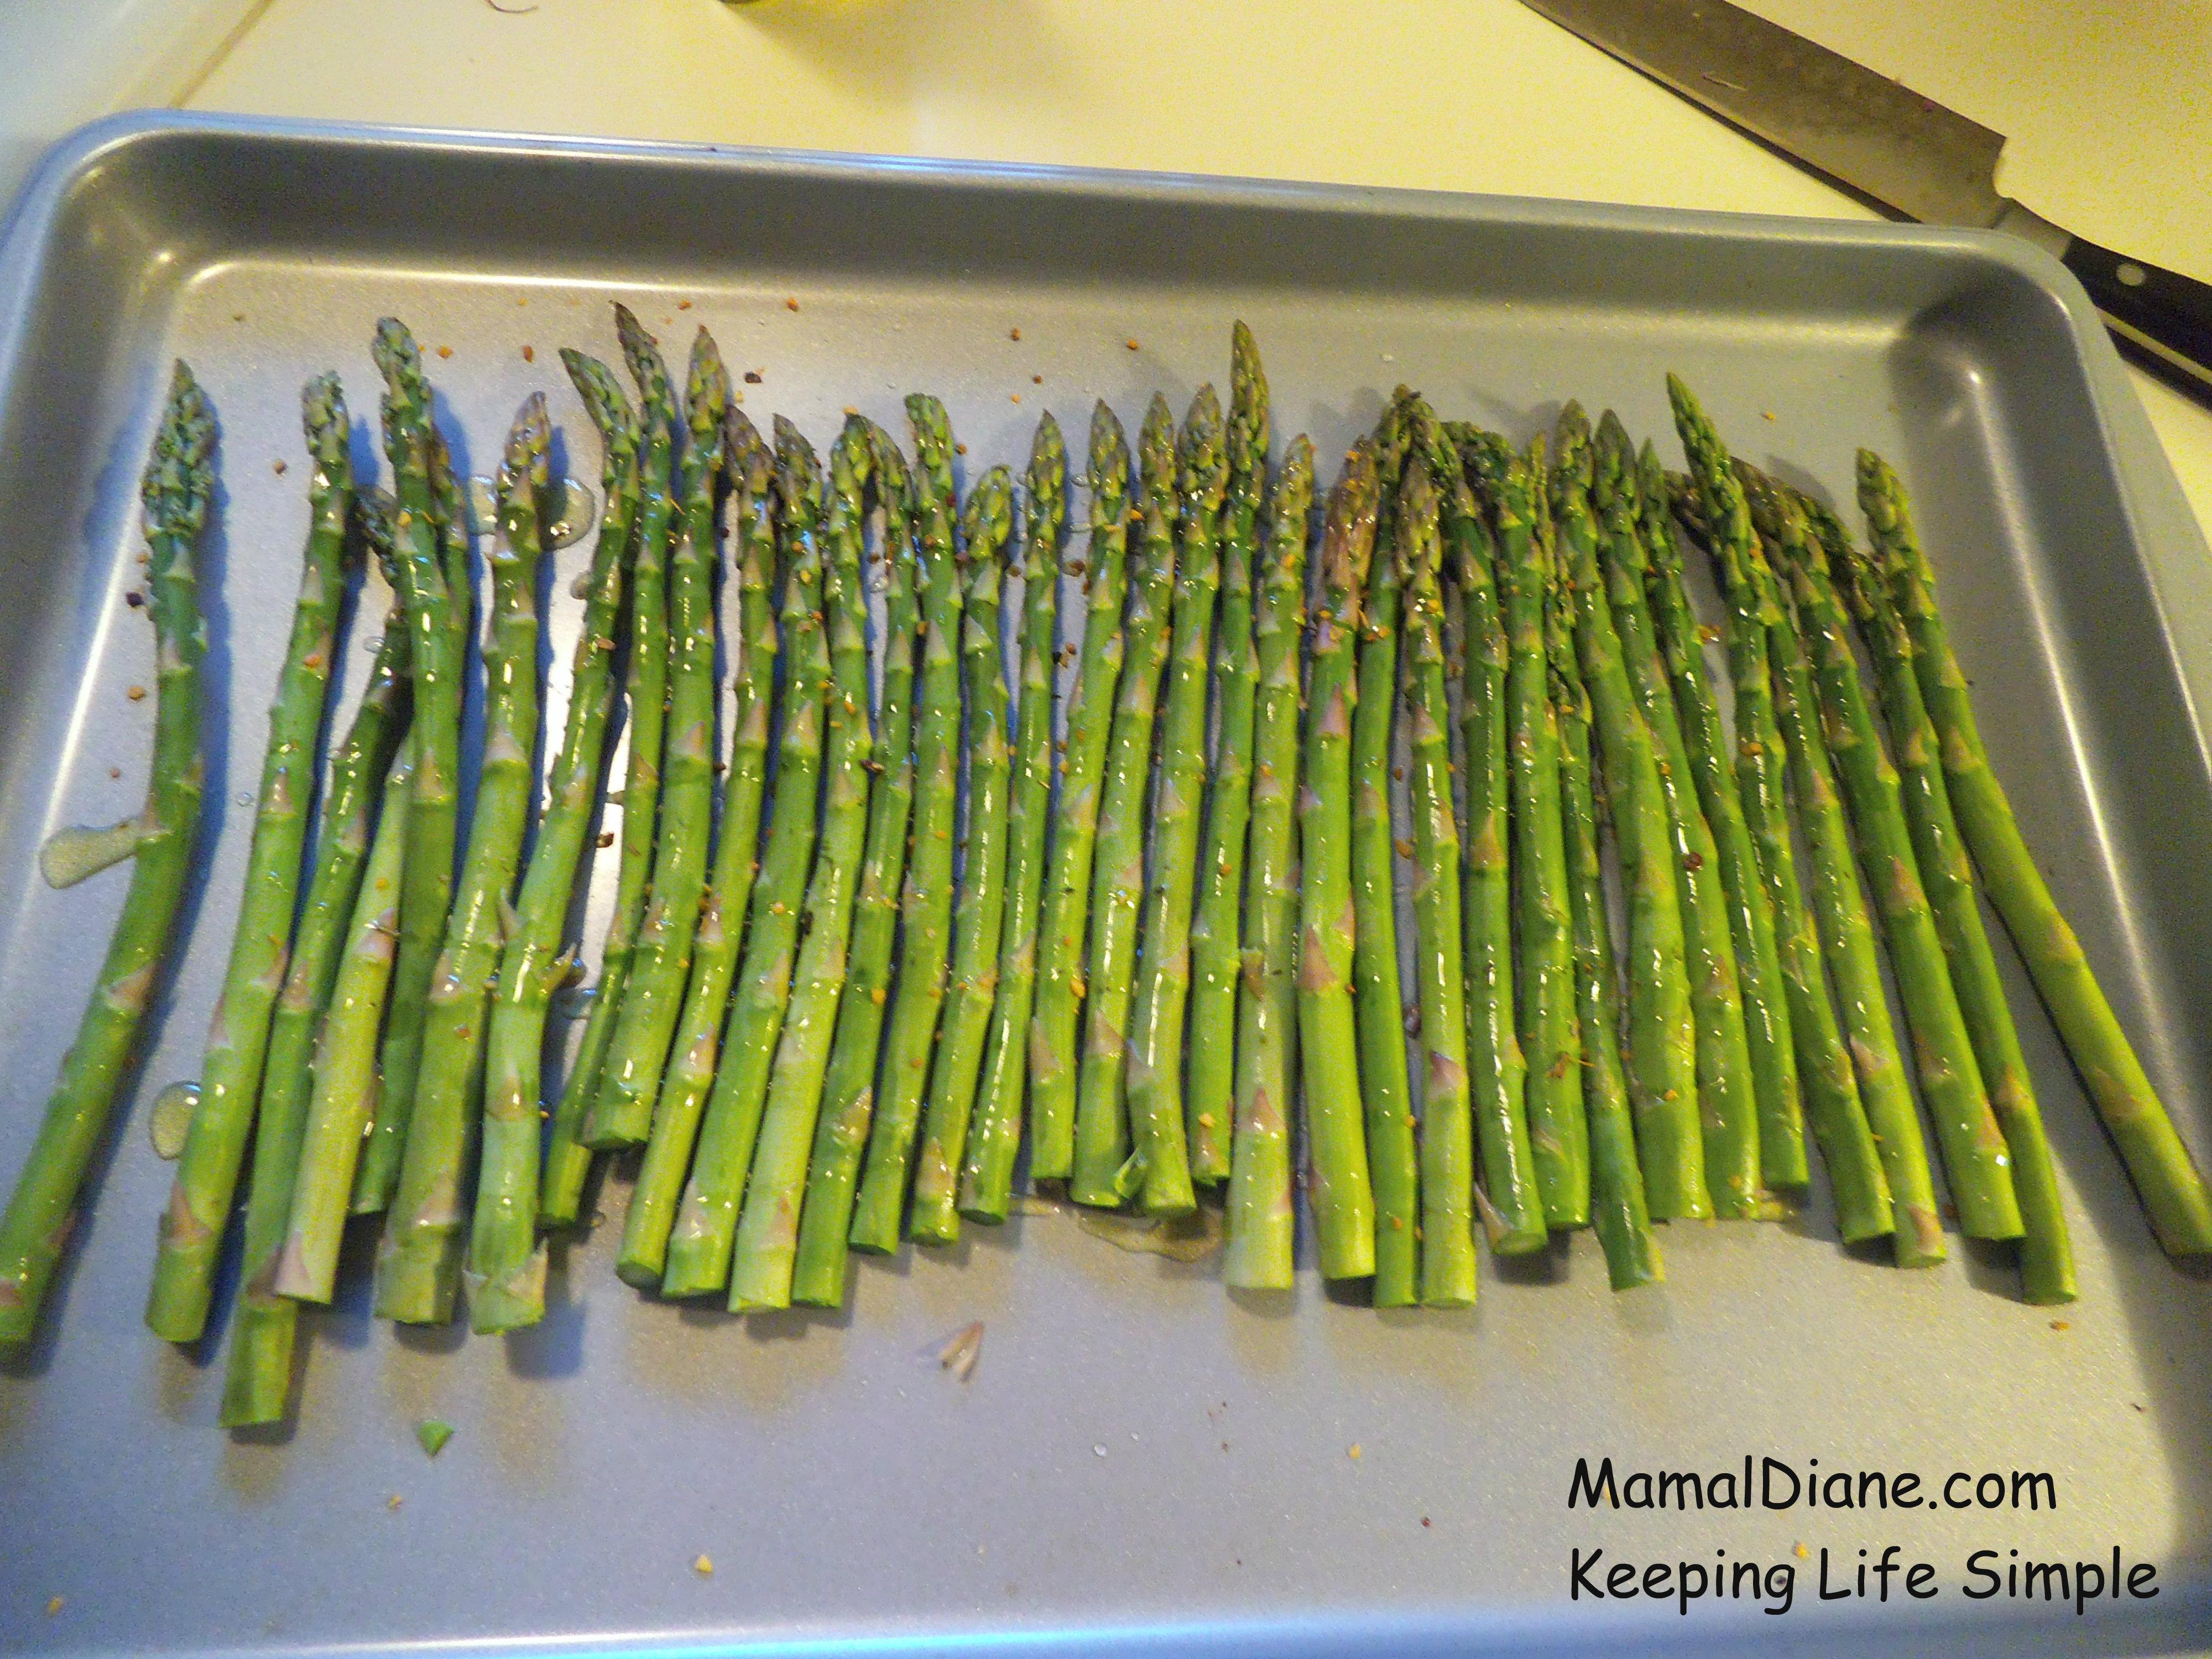 Bake Oven Roasted Asparagus €� Mamal Diane